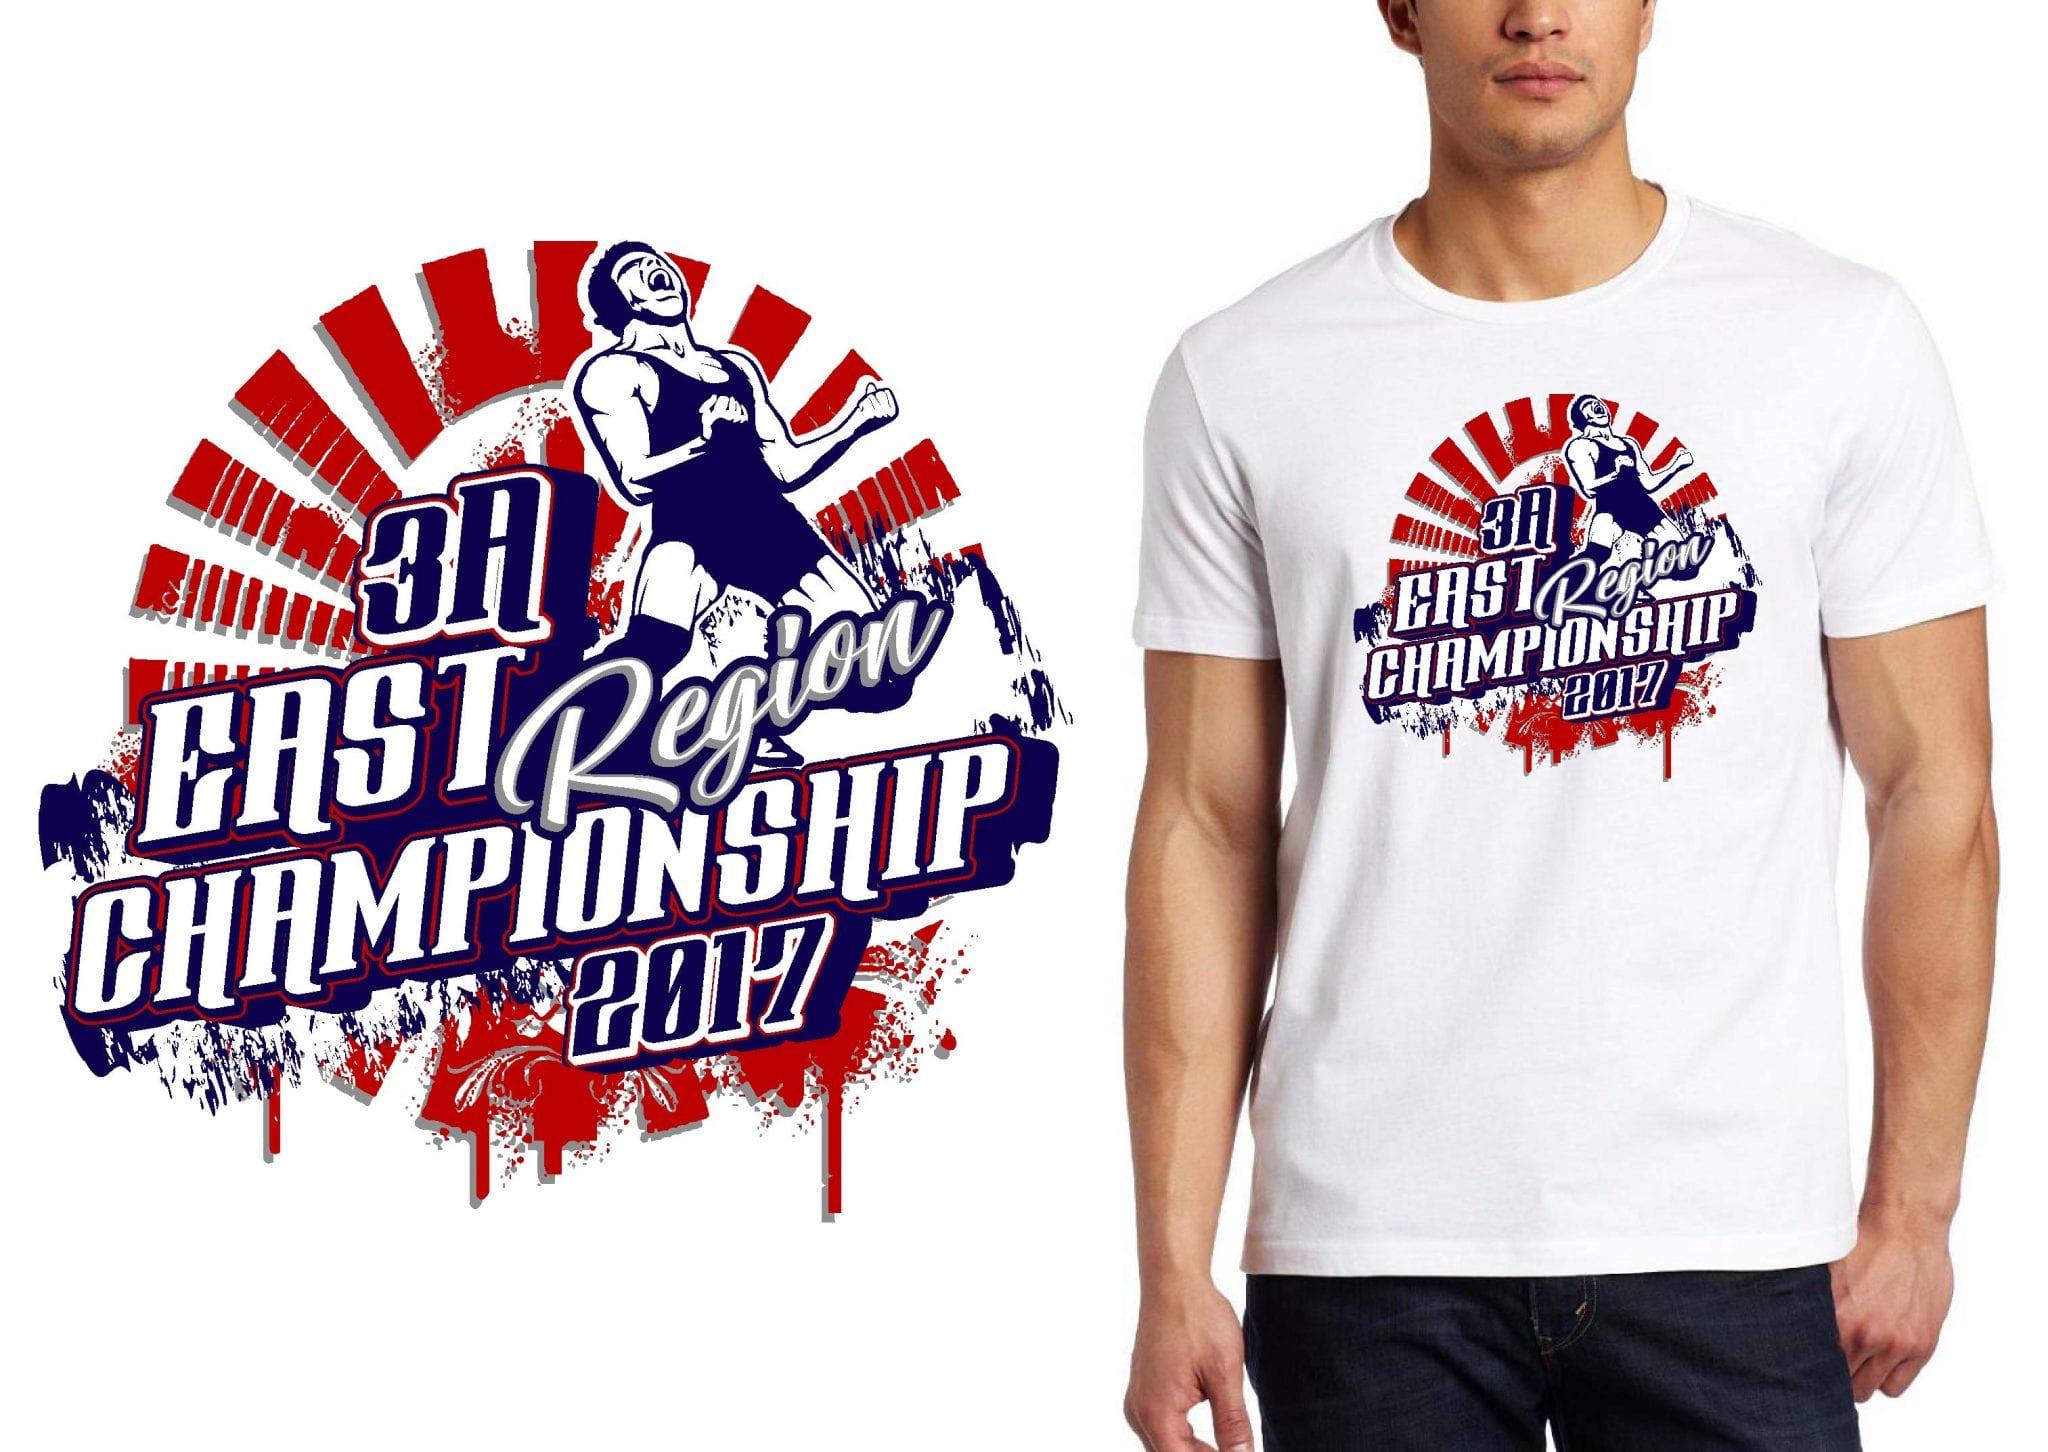 LOGO for 3A East Region Championship Wrestling T-SHIRT UrArtStudio